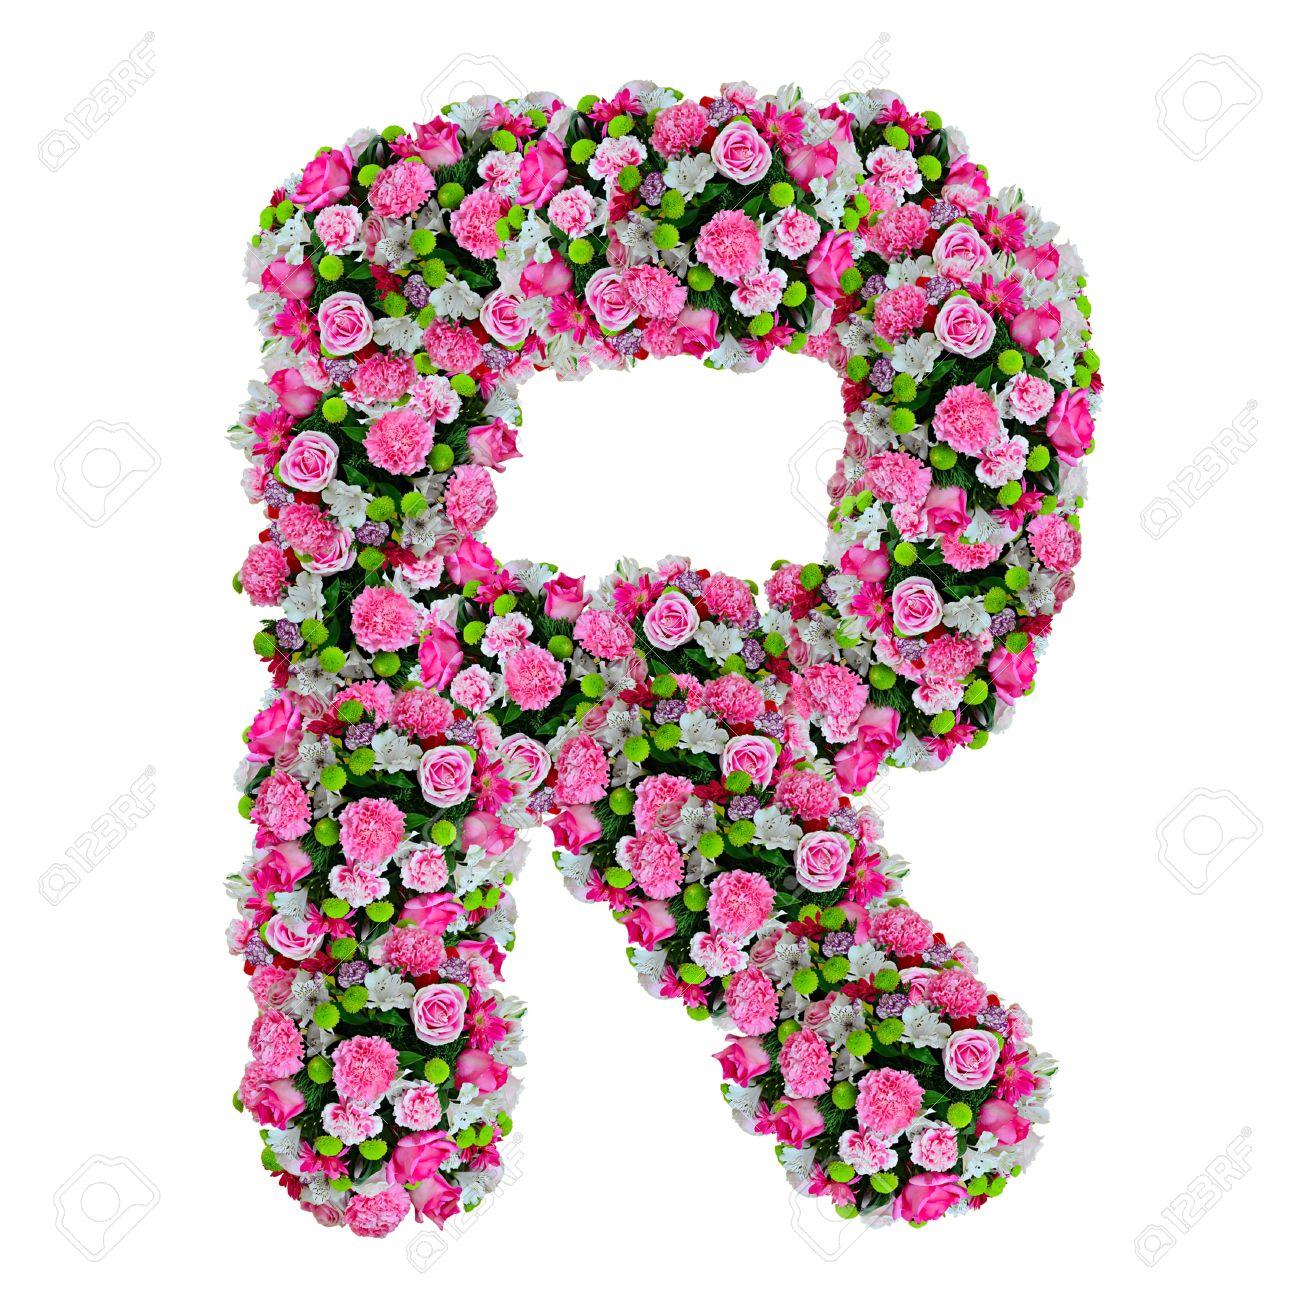 Primavera Sound 2017 || Filtraciones, exclusivas... || Bon Iver 11854446-R-flower-alphabet-isolated-on-white-with-clipping-path-Stock-Photo